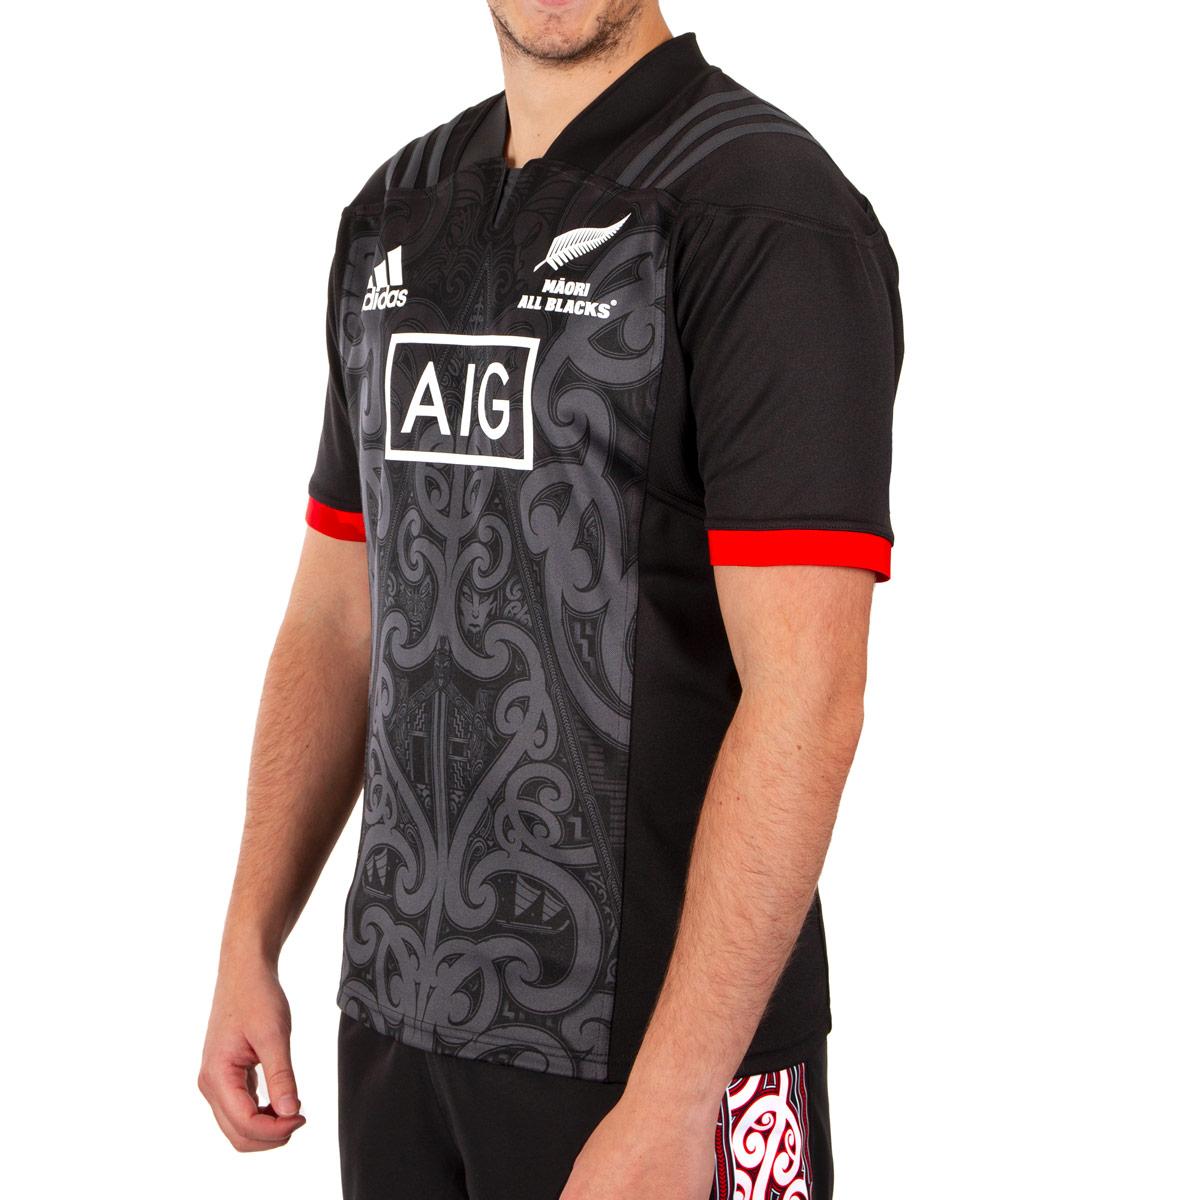 low priced c320c 5c31c 2019 Mens All Blacks Maori Rugby Shirt (Short Sleeved)